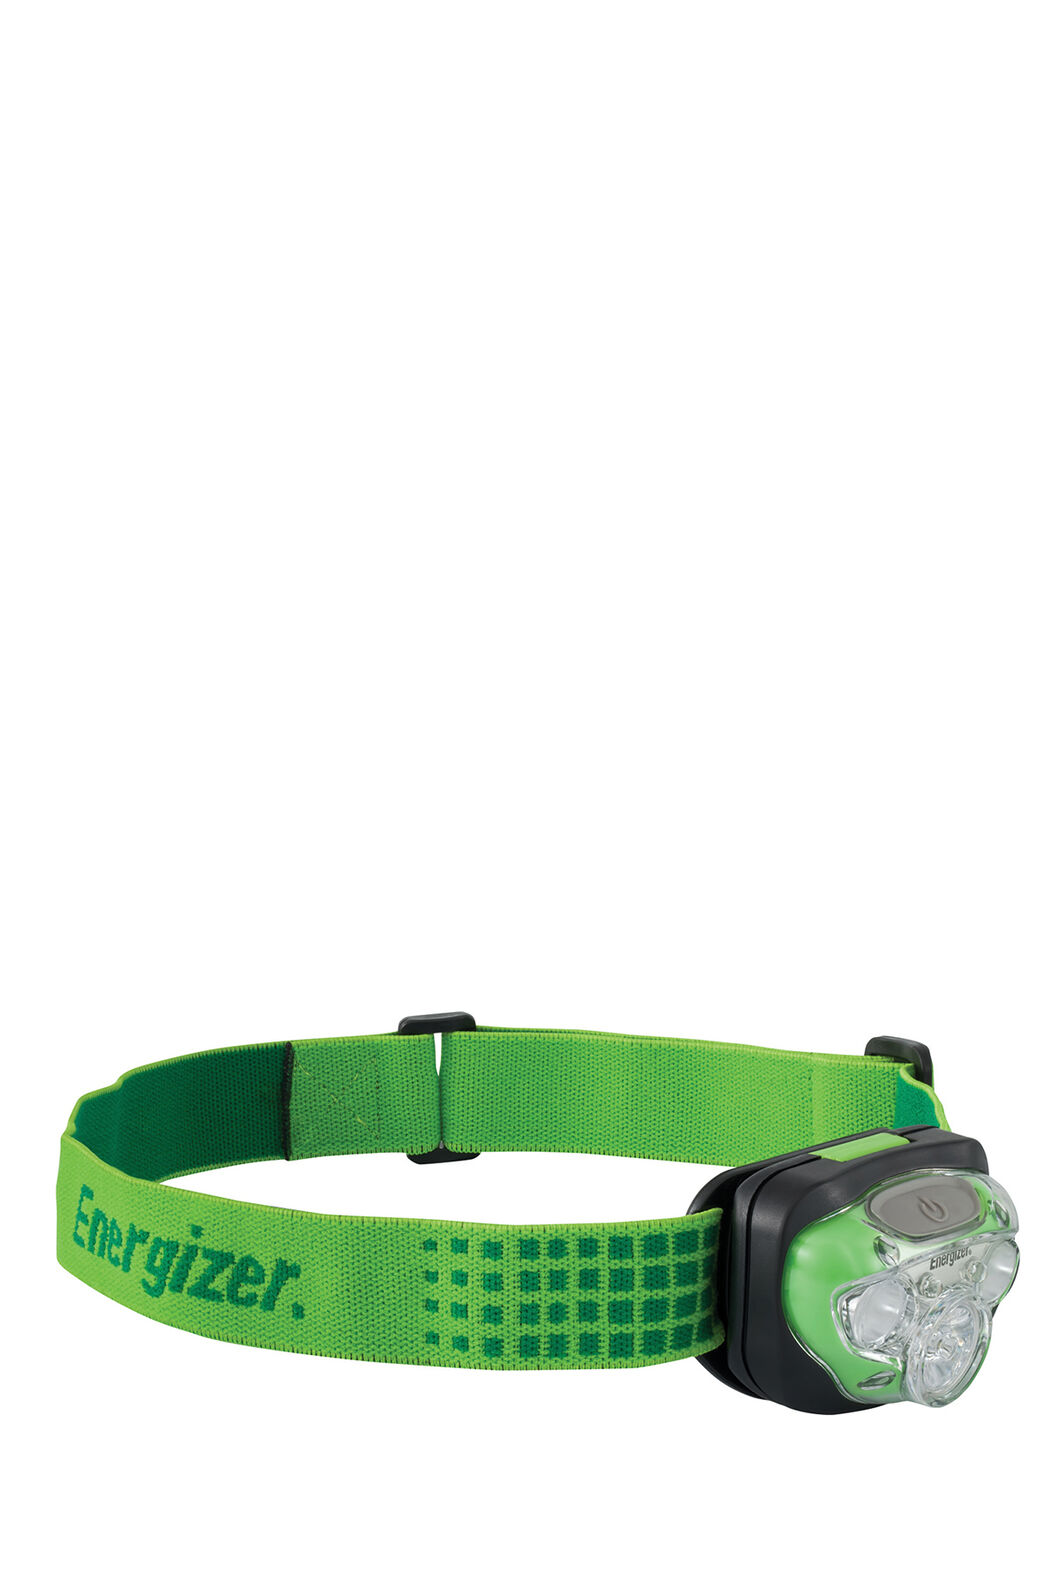 Energizer Vision HD Headlamp, None, hi-res